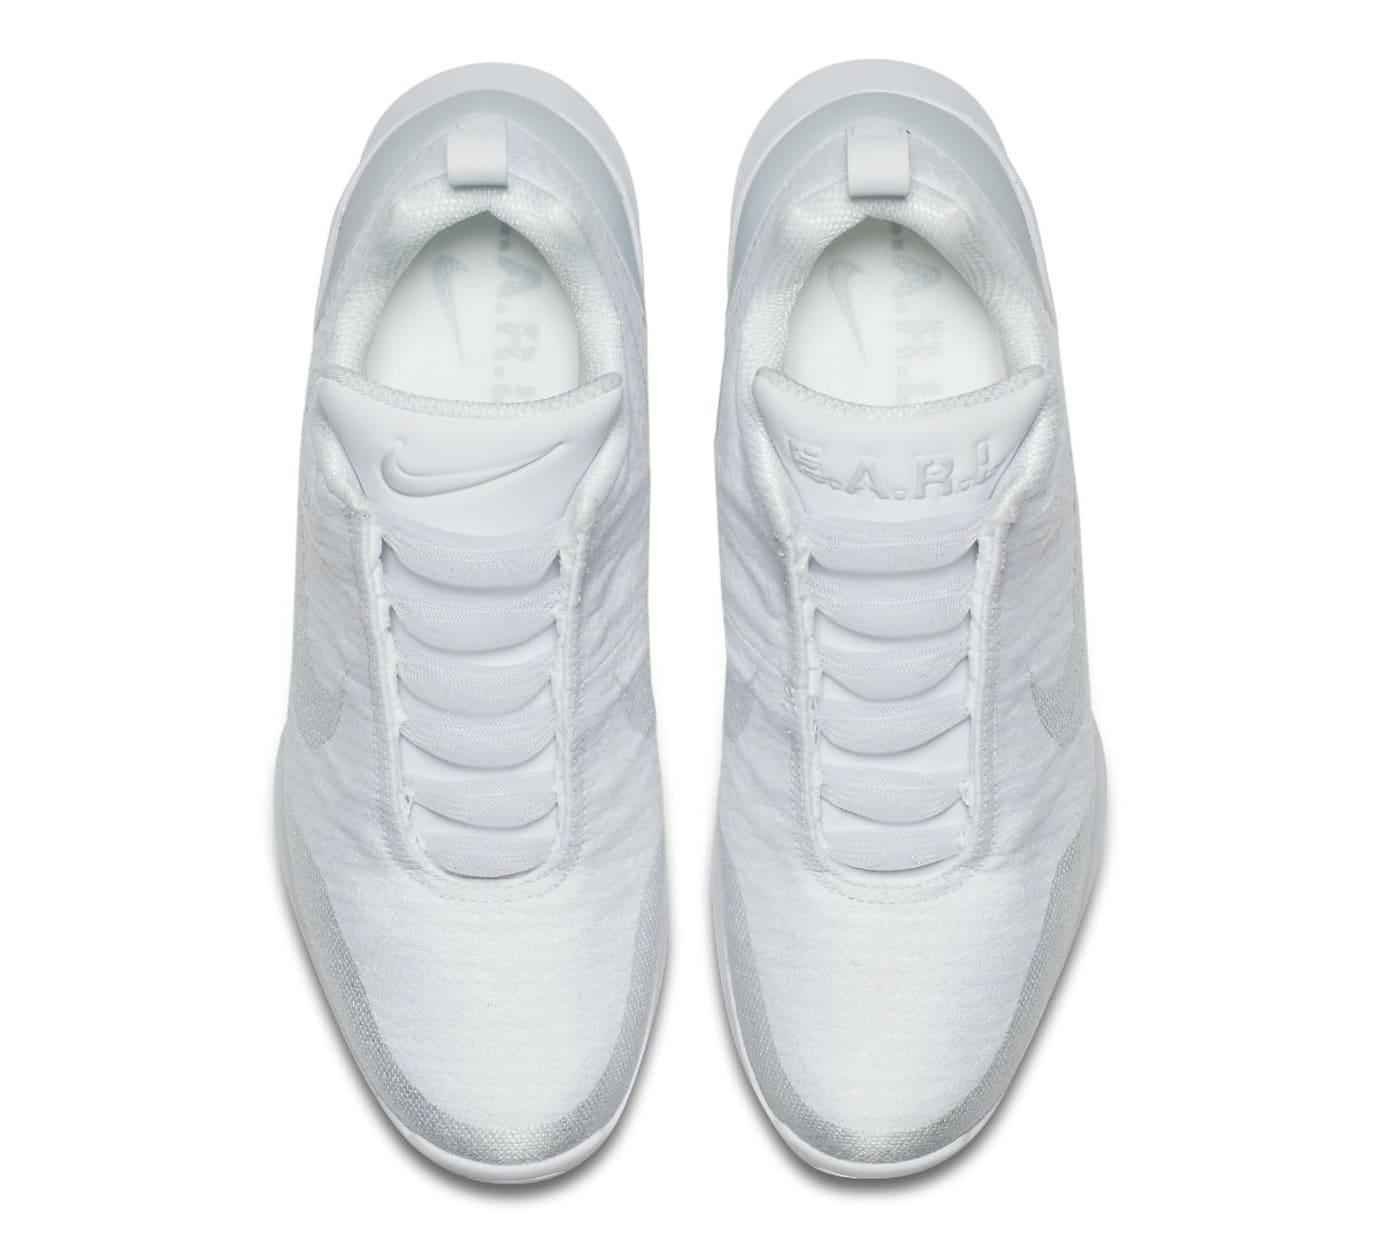 Nike HyperAdapt 1.0 Triple White Release Date AH9389-102 Top